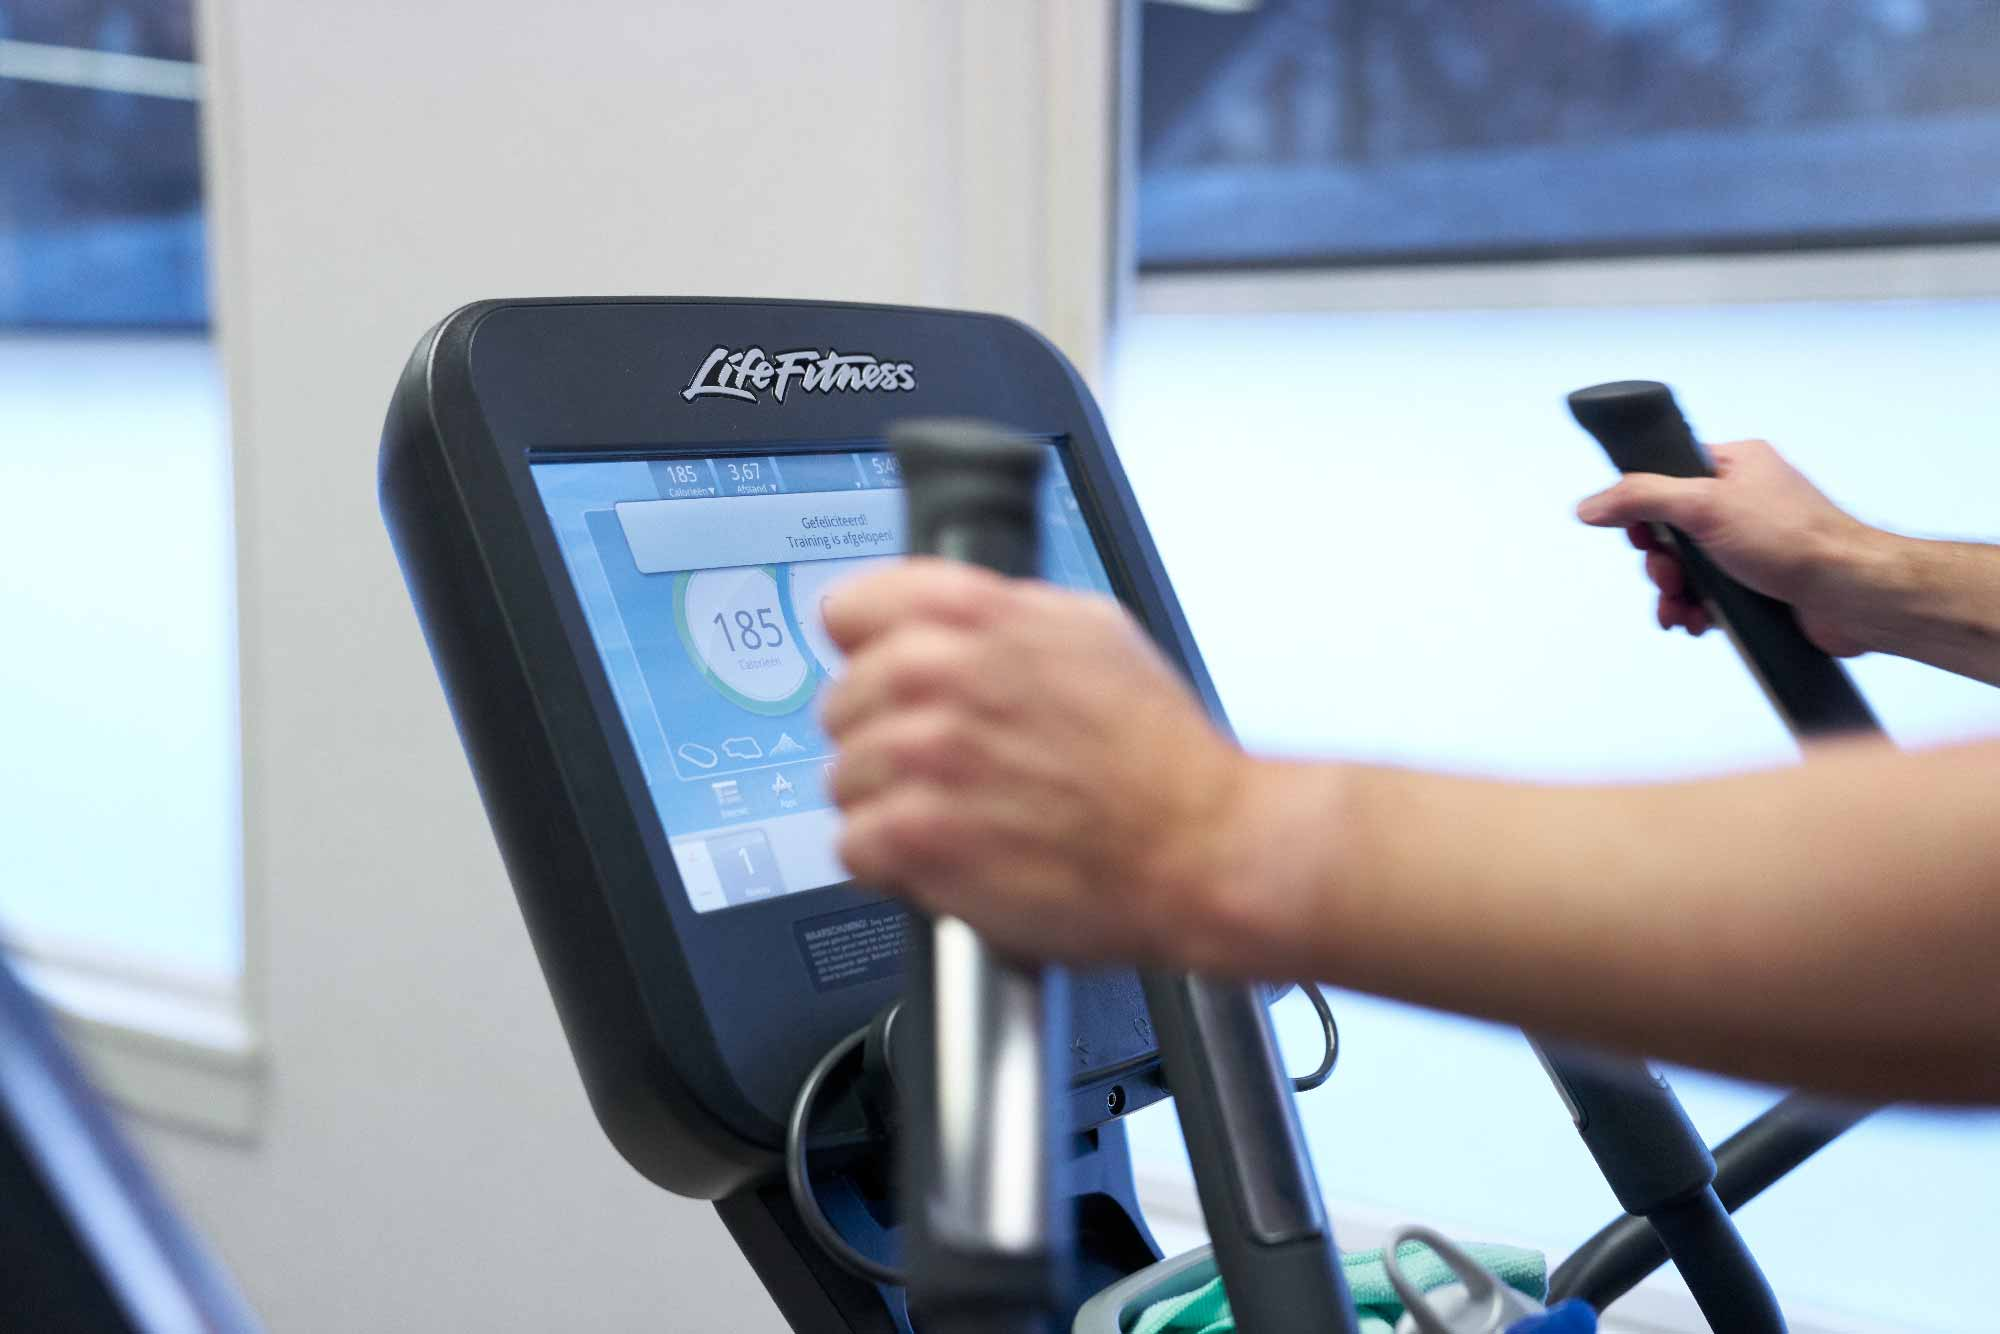 fitness met tabletconsole frits van der werff